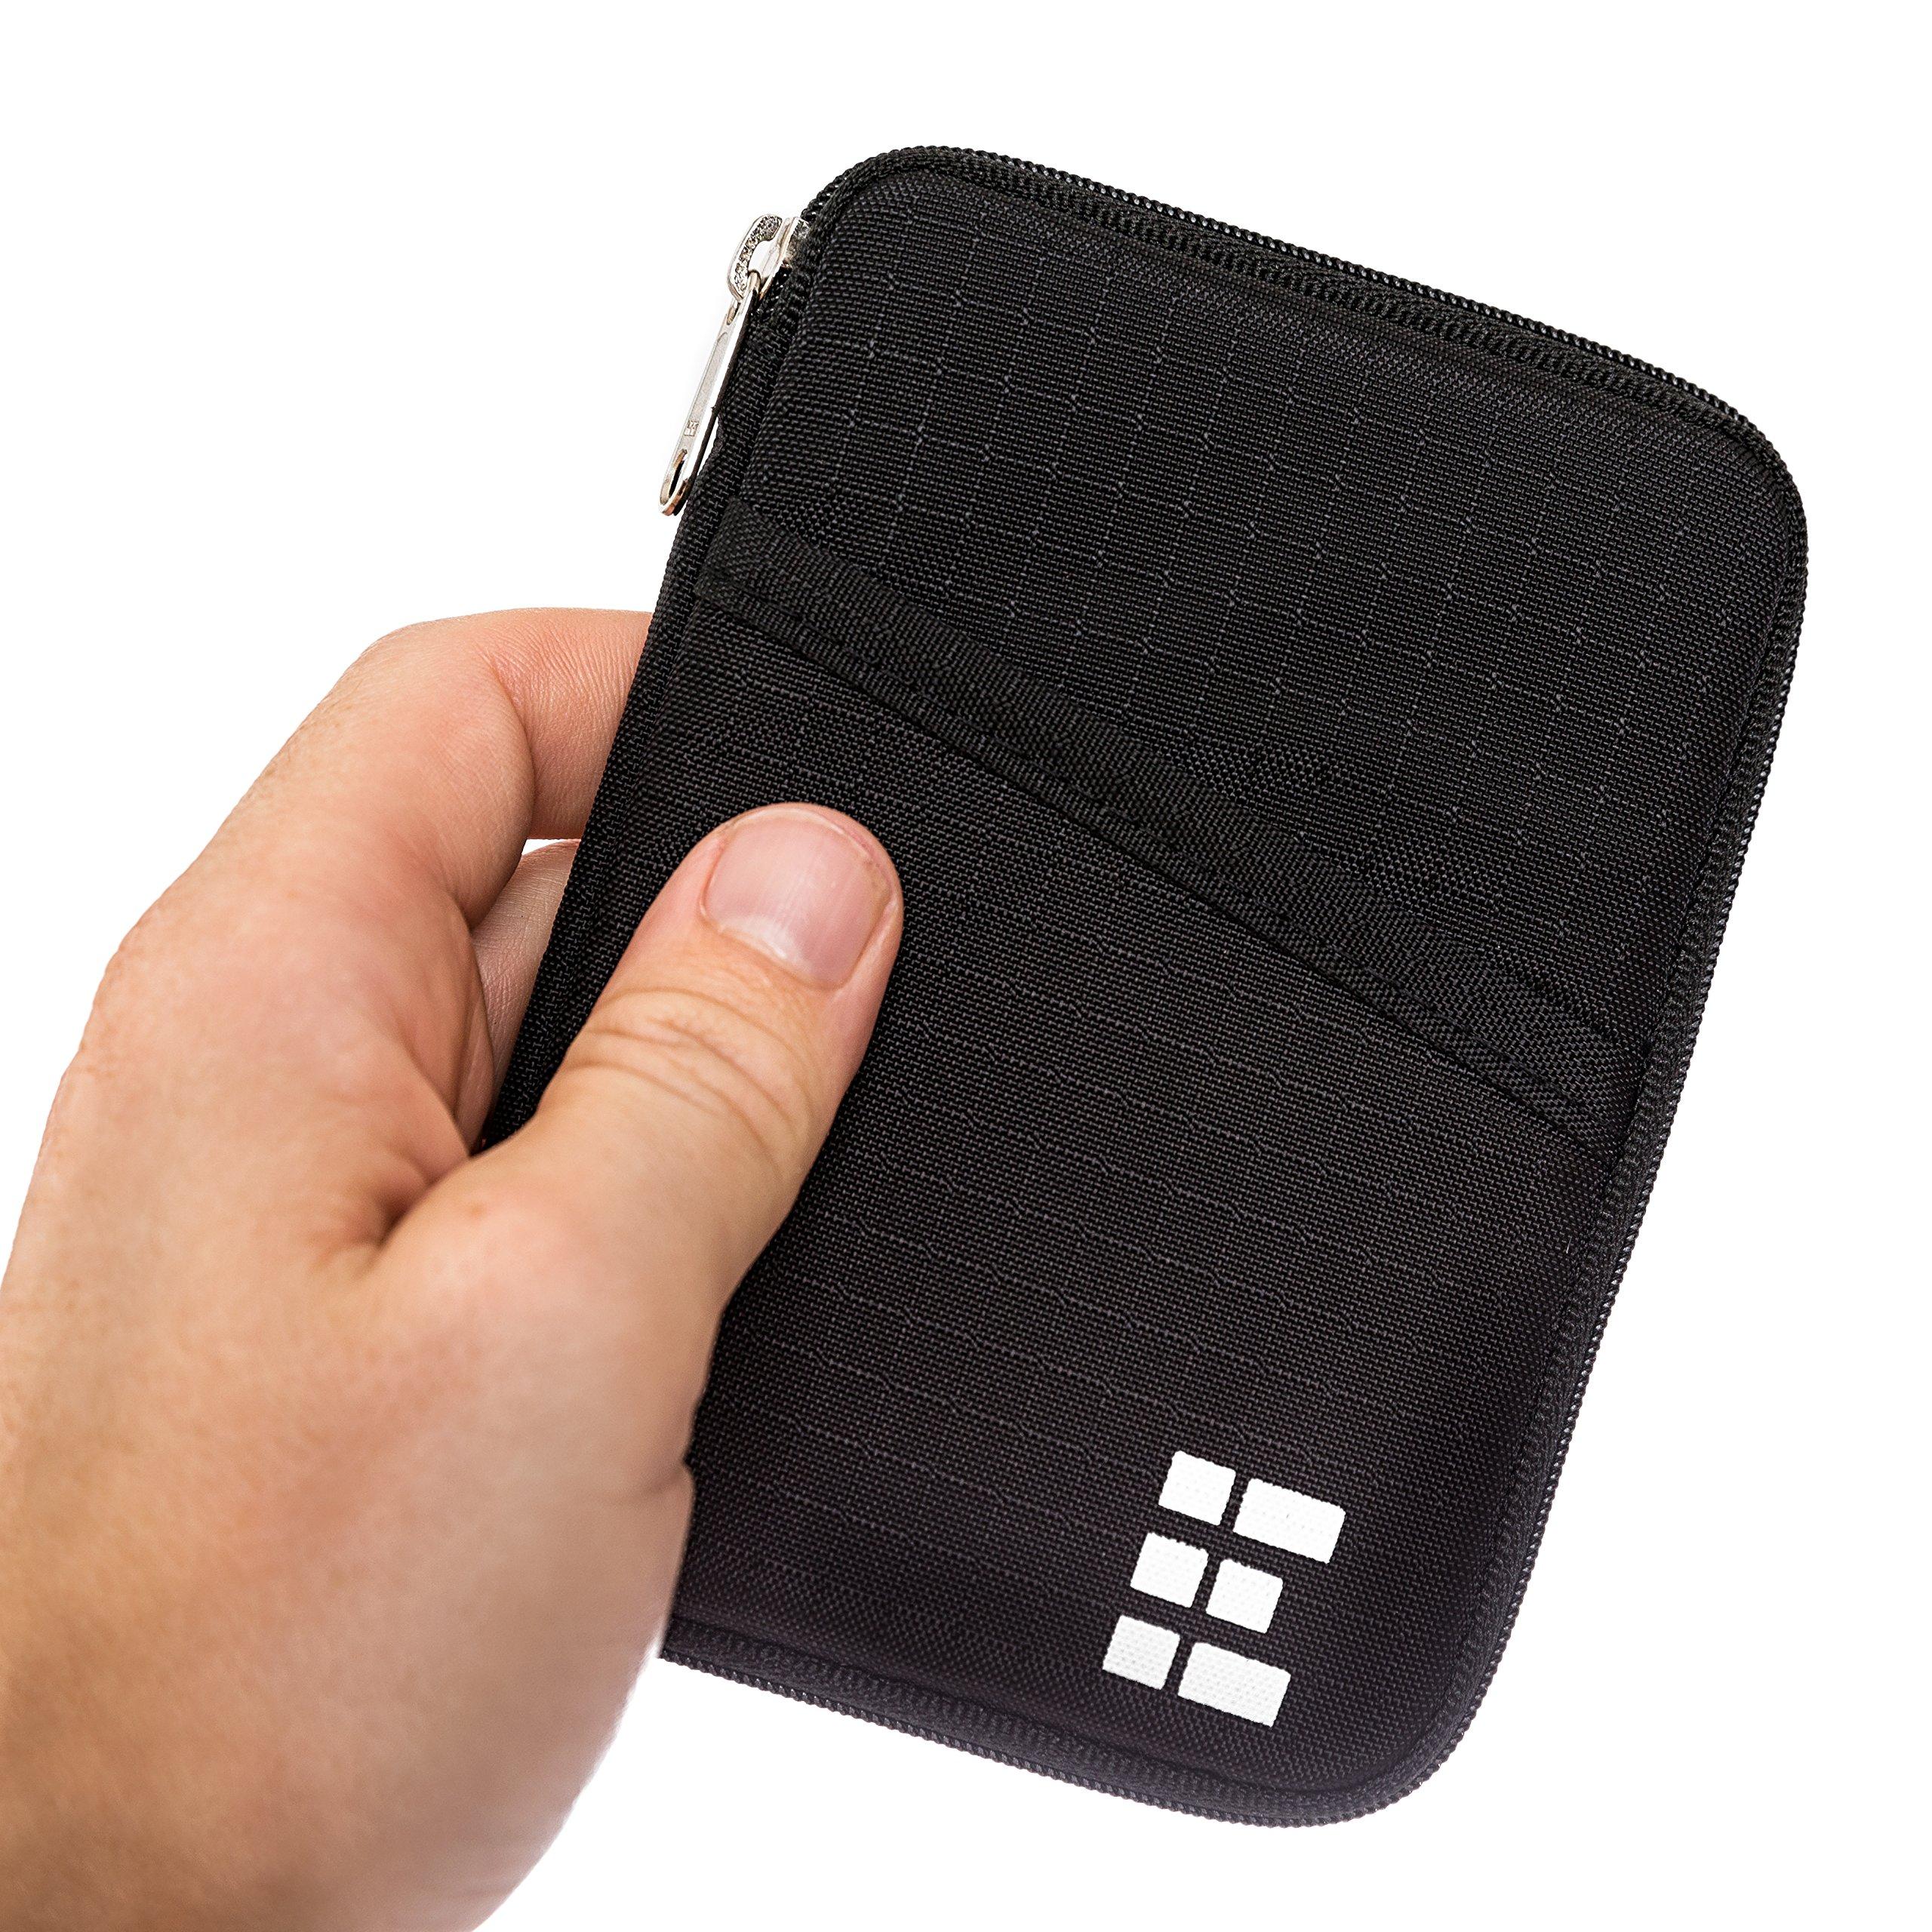 Cartera de Viaje Portadocumentos - Funda para Pasaporte - Organizador de Viajes con Bloqueo RFID product